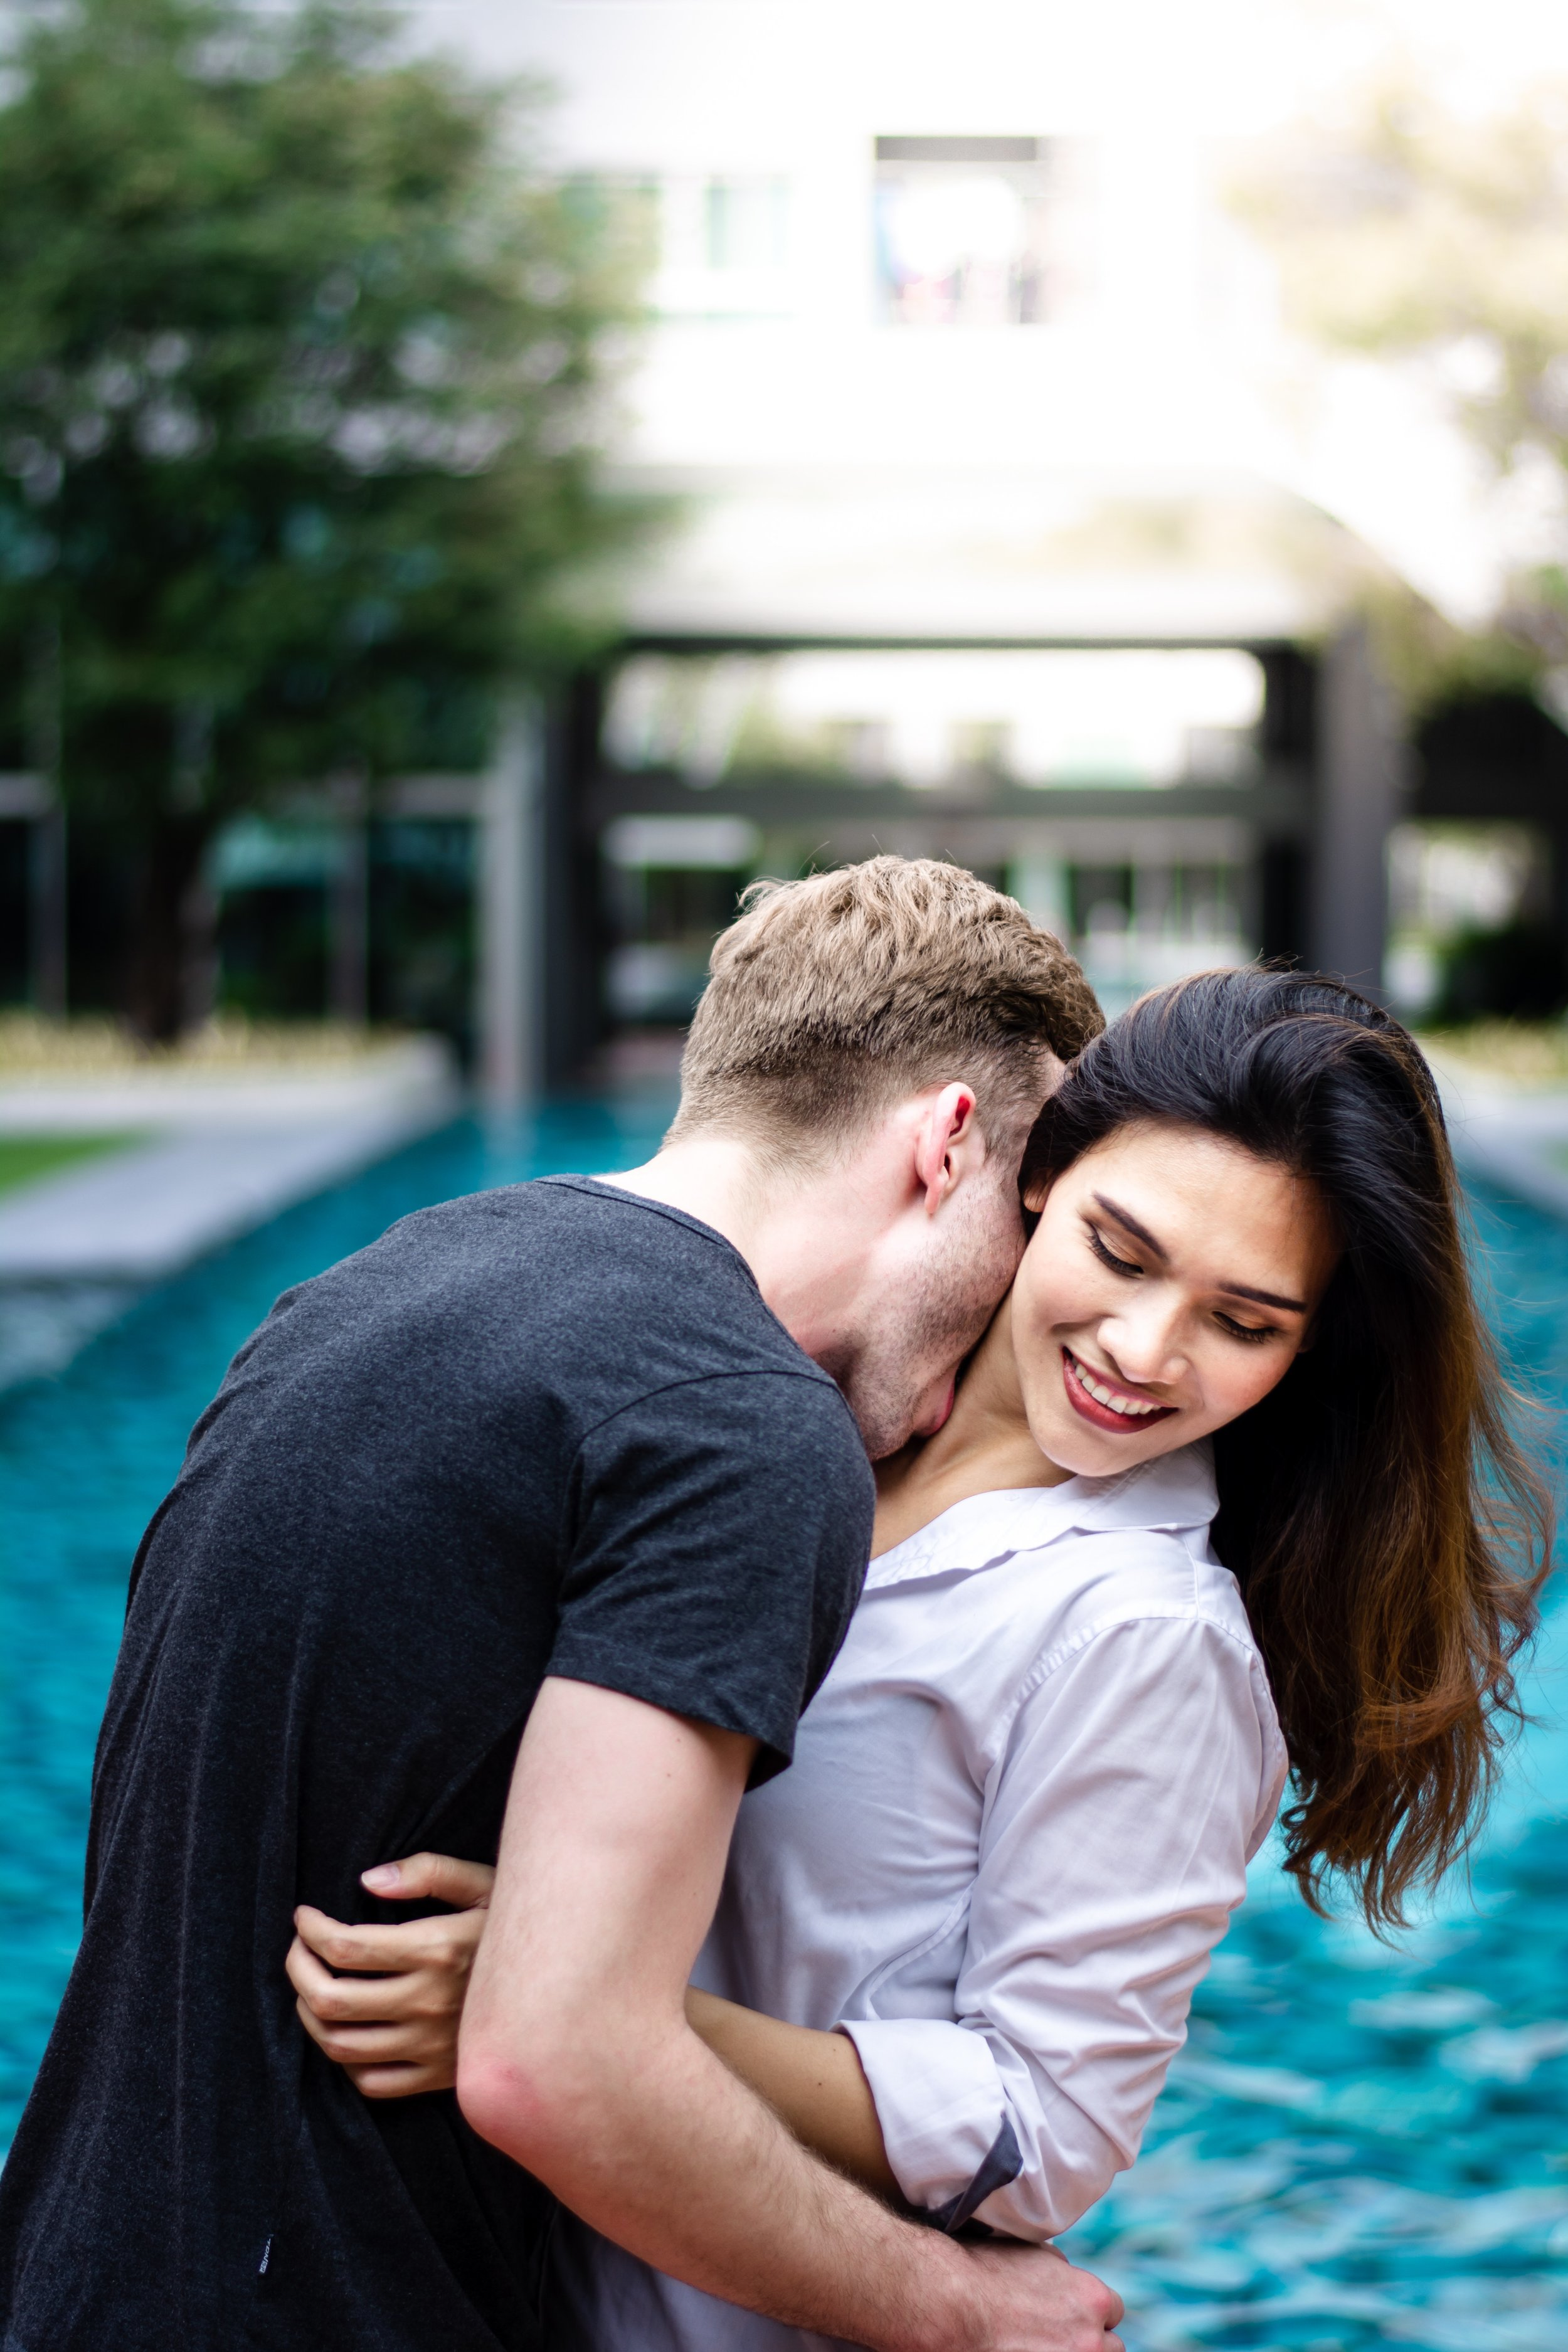 blurred-background-couple-daytime-1232019.jpg